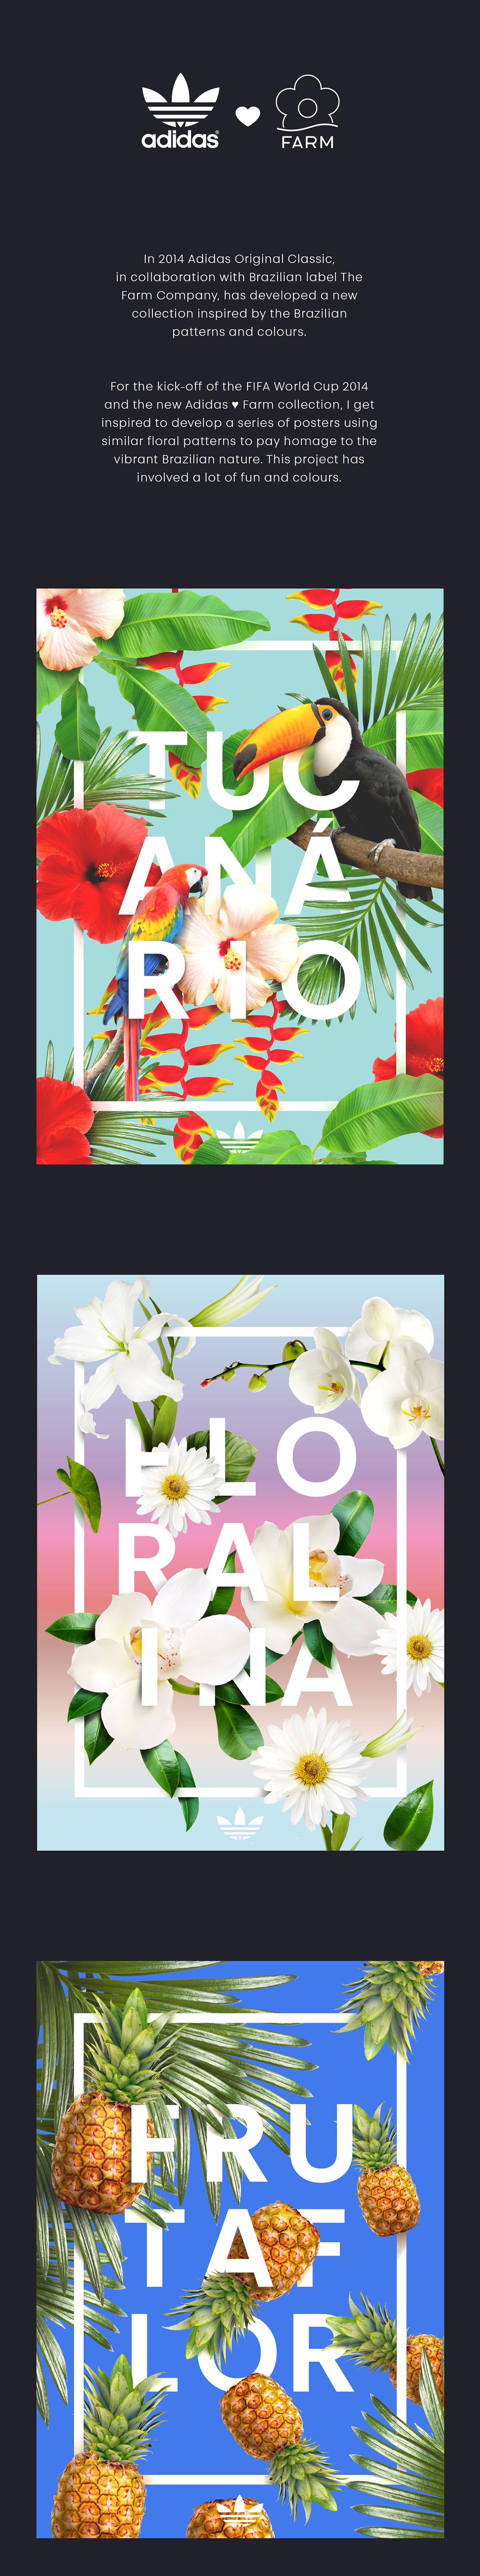 adidas farm poster Brasil pattern tucanario floralina frutaflor colours Flowers Collection series Fun Illustrator photoshop